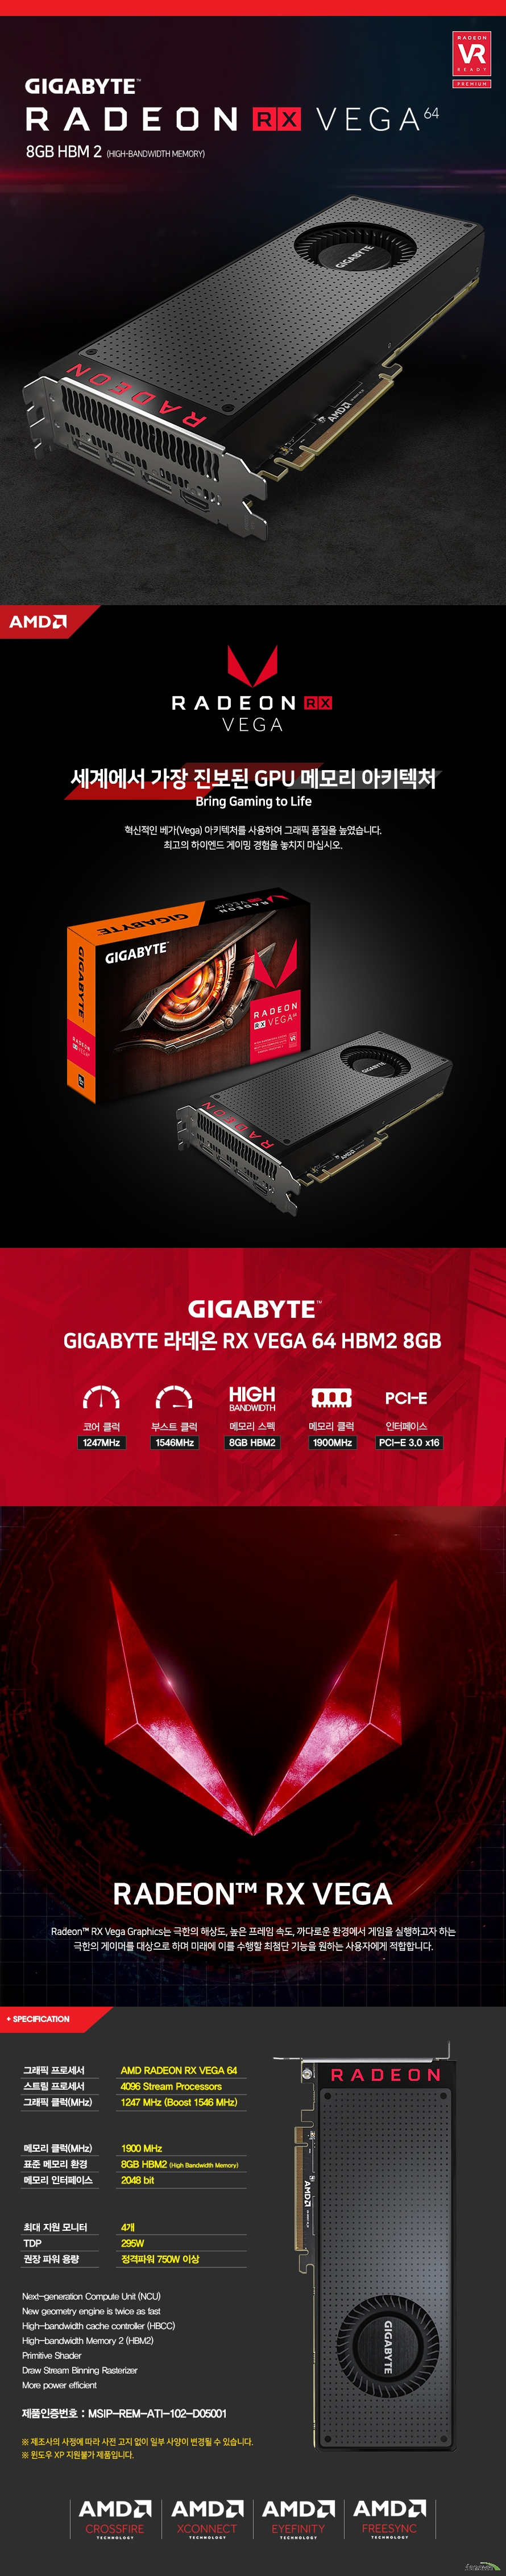 GIGABYTE 라데온 RX VEGA 64 HBM2 8GB 블랙 가등록 DB